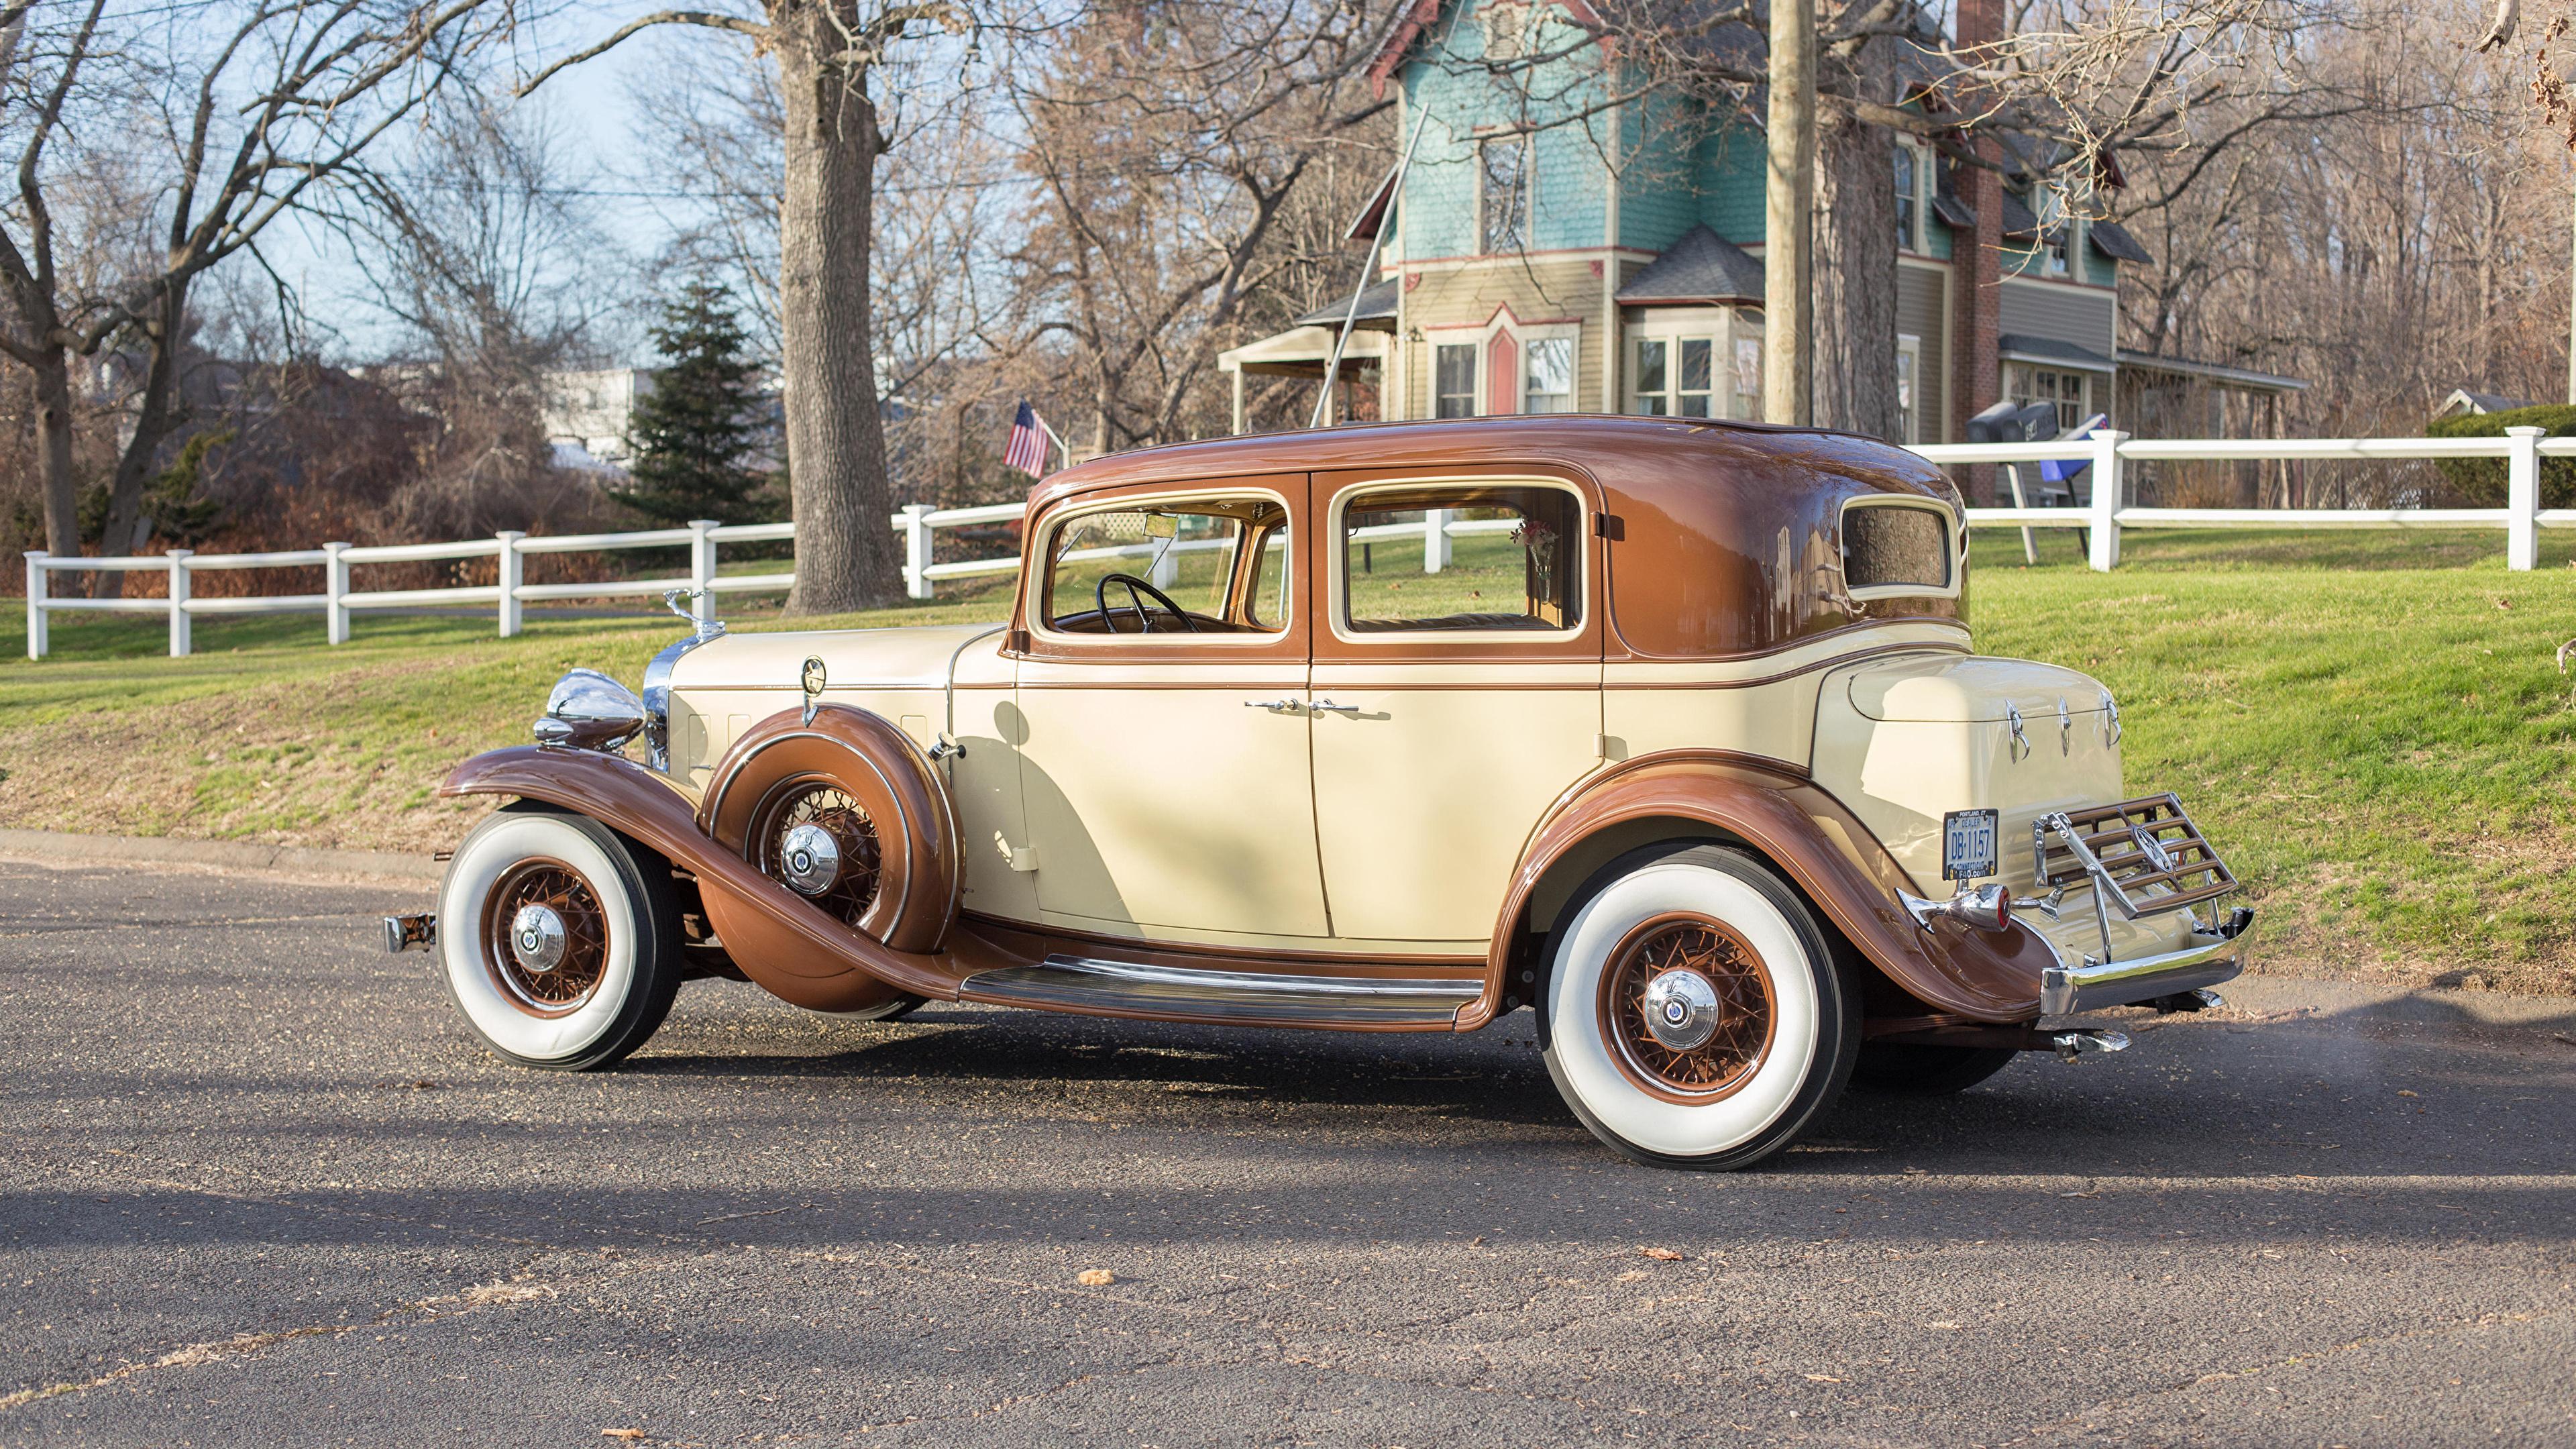 Картинка Cadillac 1932 V12 370-B Town Sedan by Fisher Сбоку Автомобили 3840x2160 Кадиллак авто машины машина автомобиль